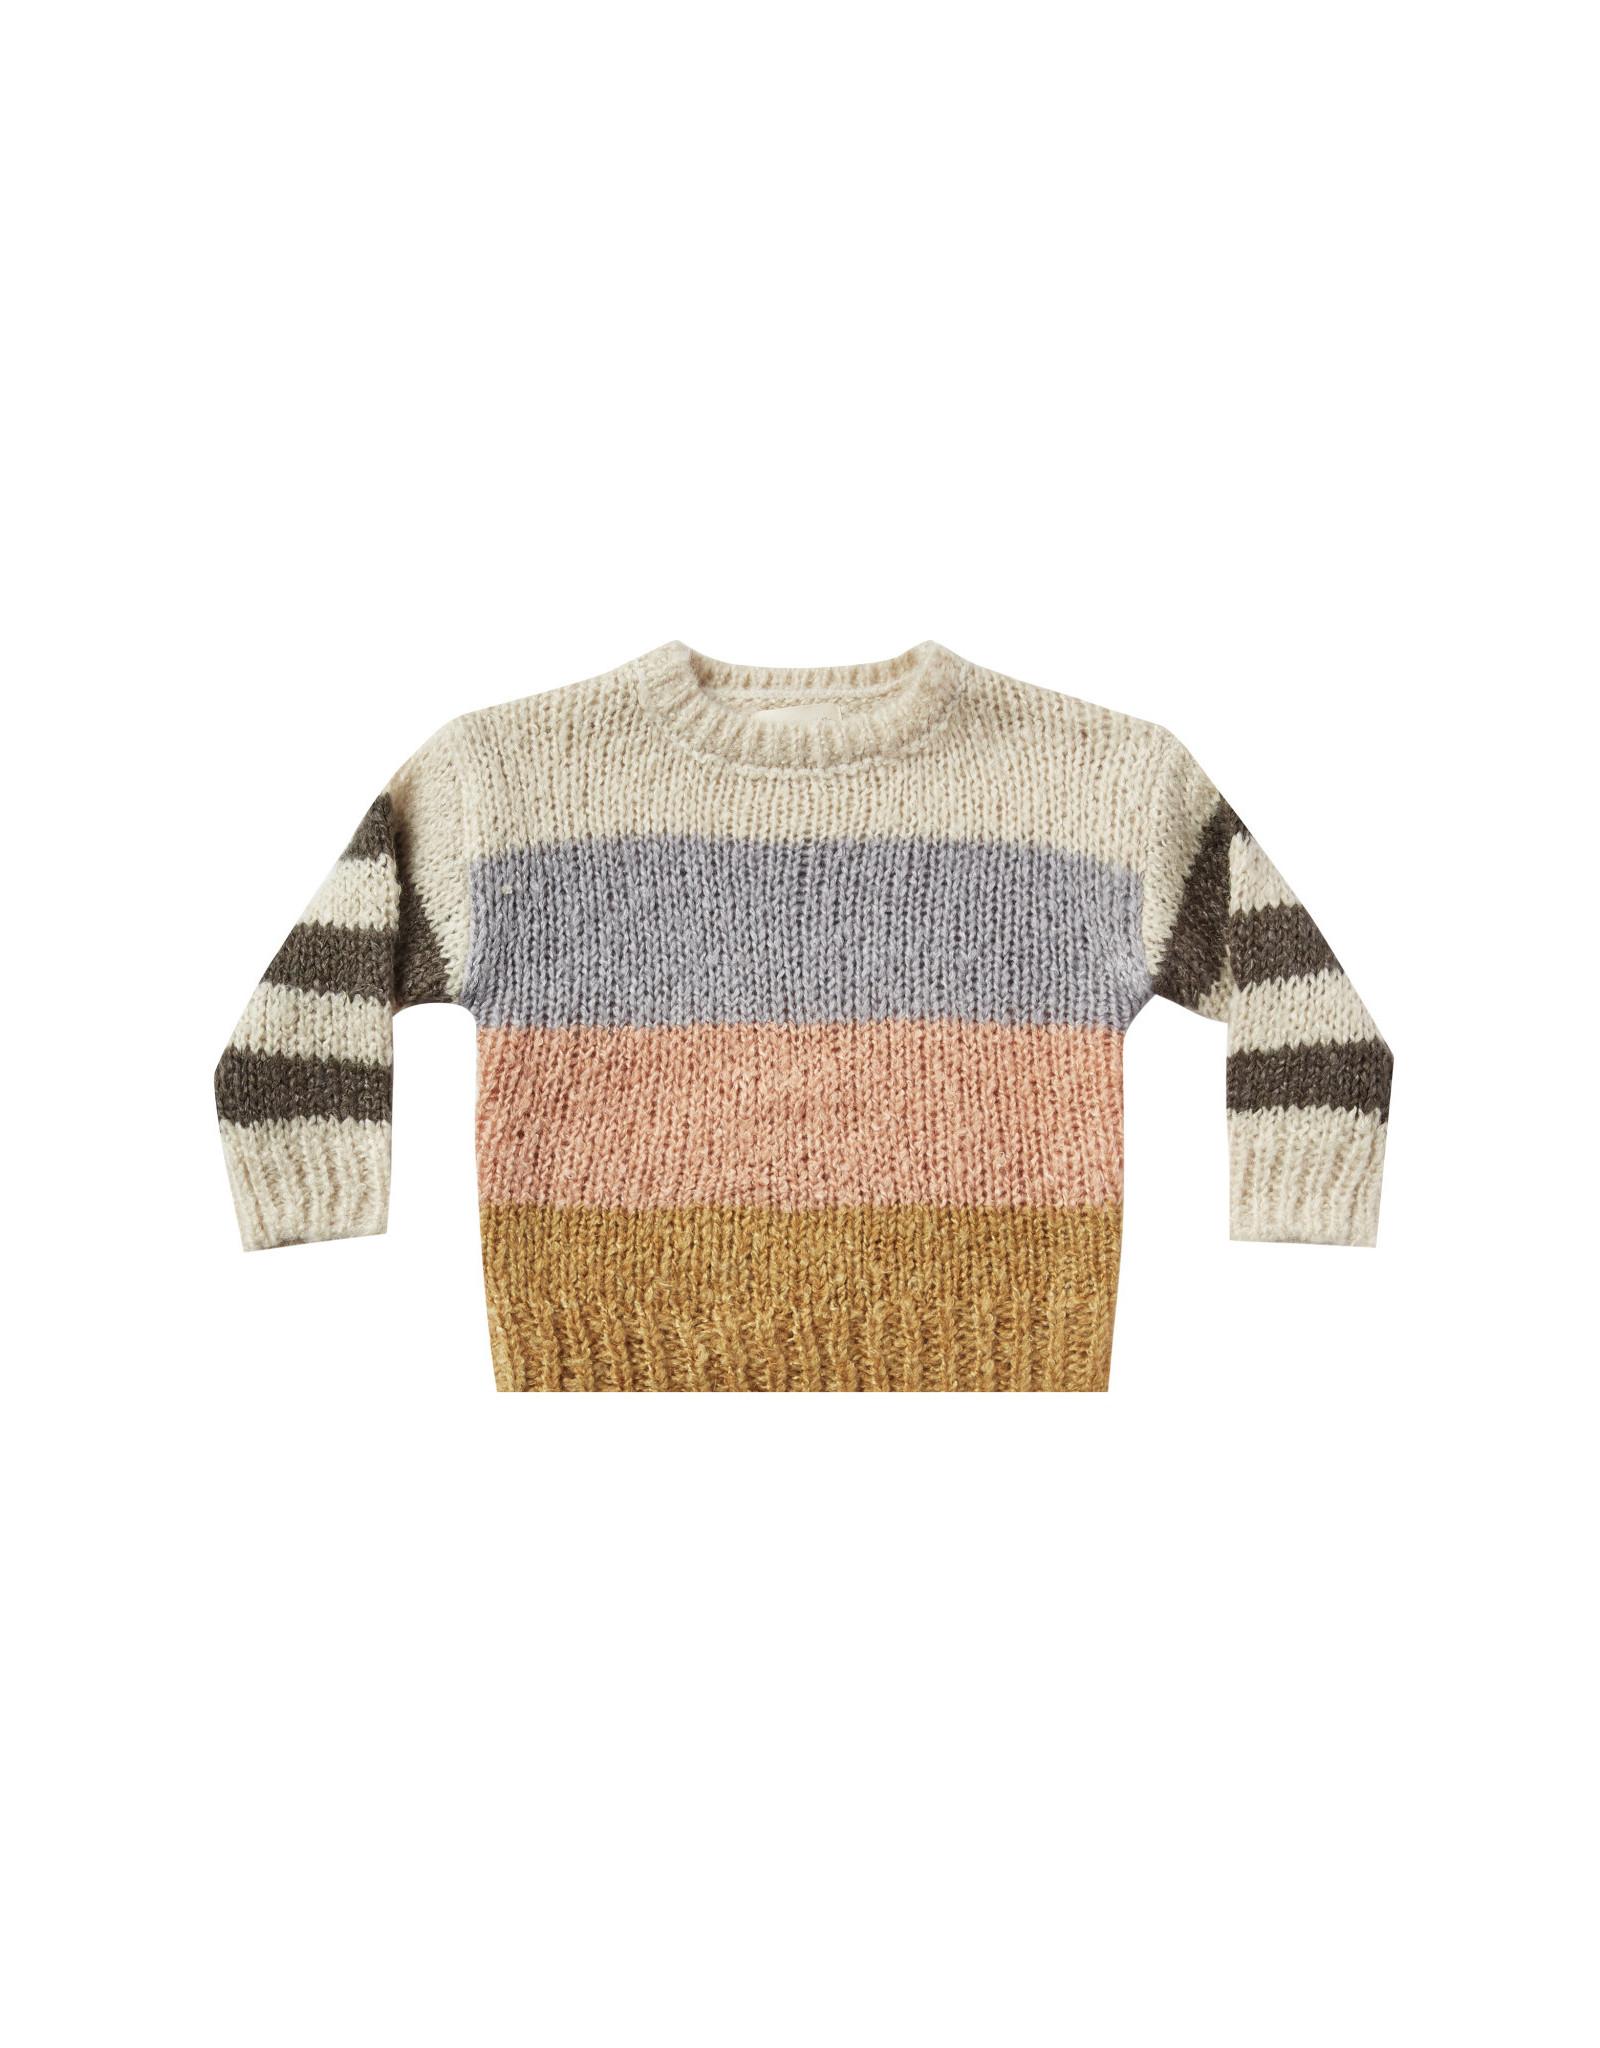 Rylee + Cru Rylee + Cru Stripe Aspen Sweater